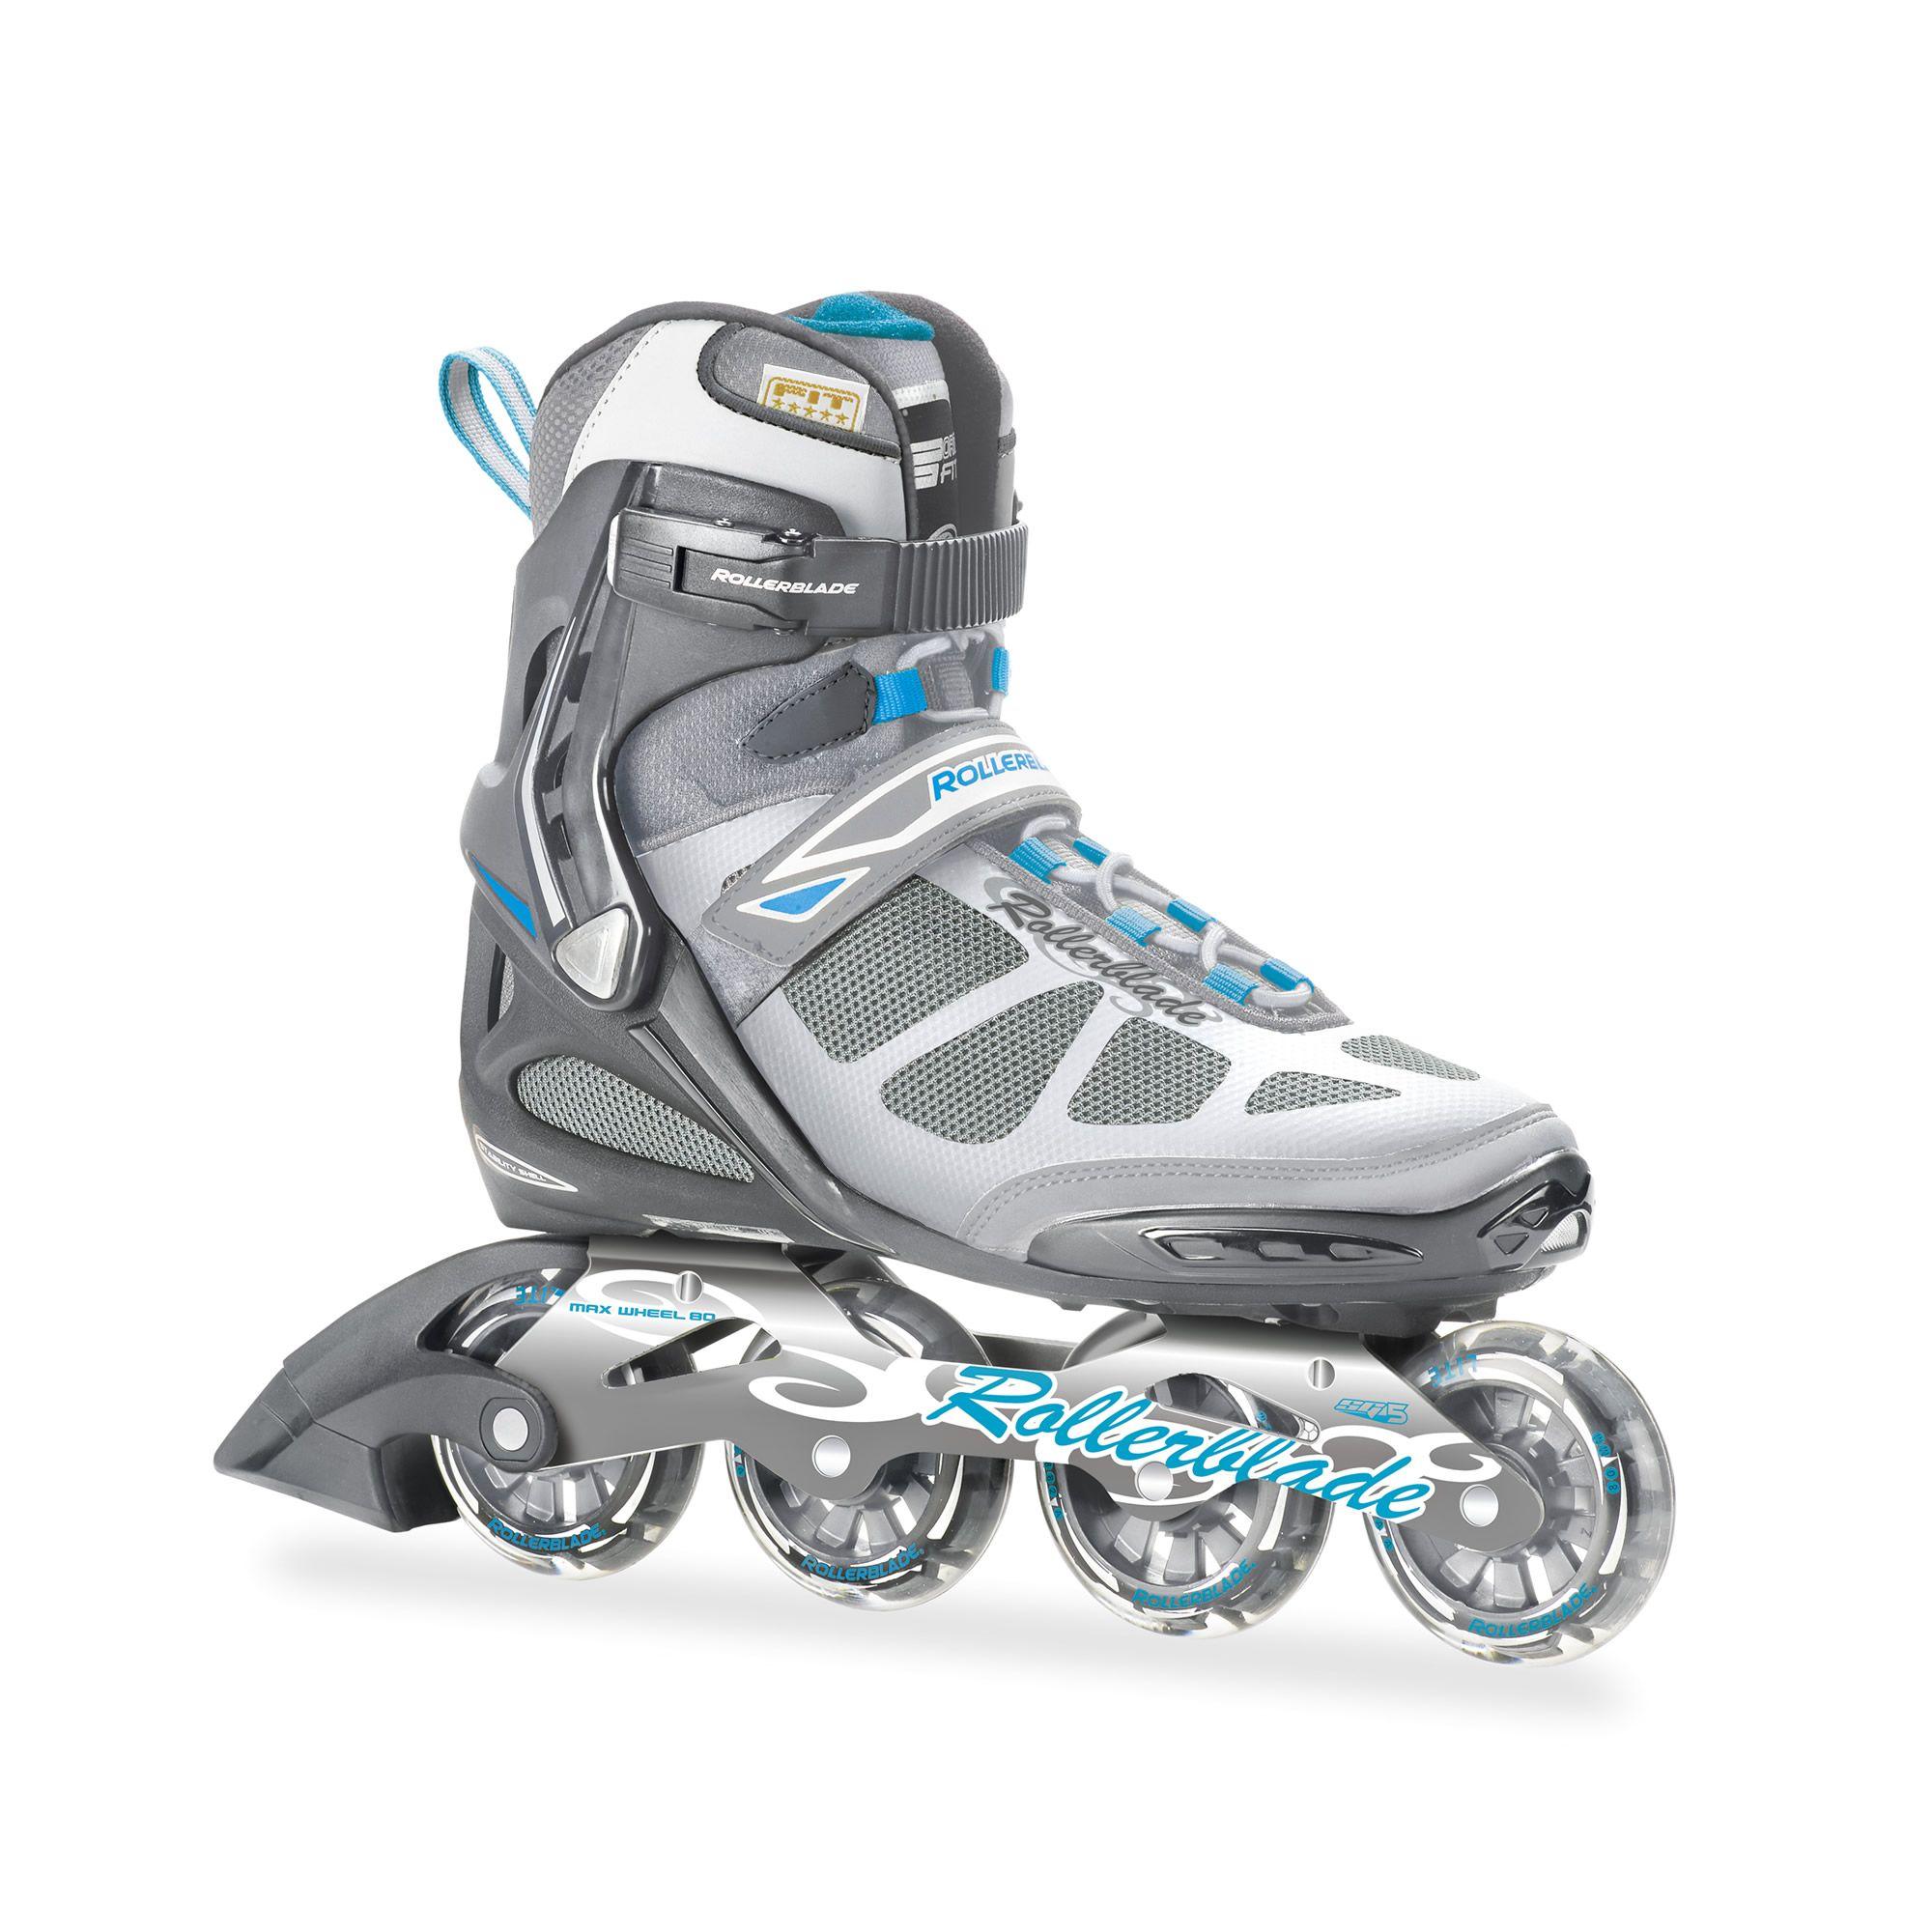 Rollerblade Spark 80 ALU W 2014 Light Blue Retail 349